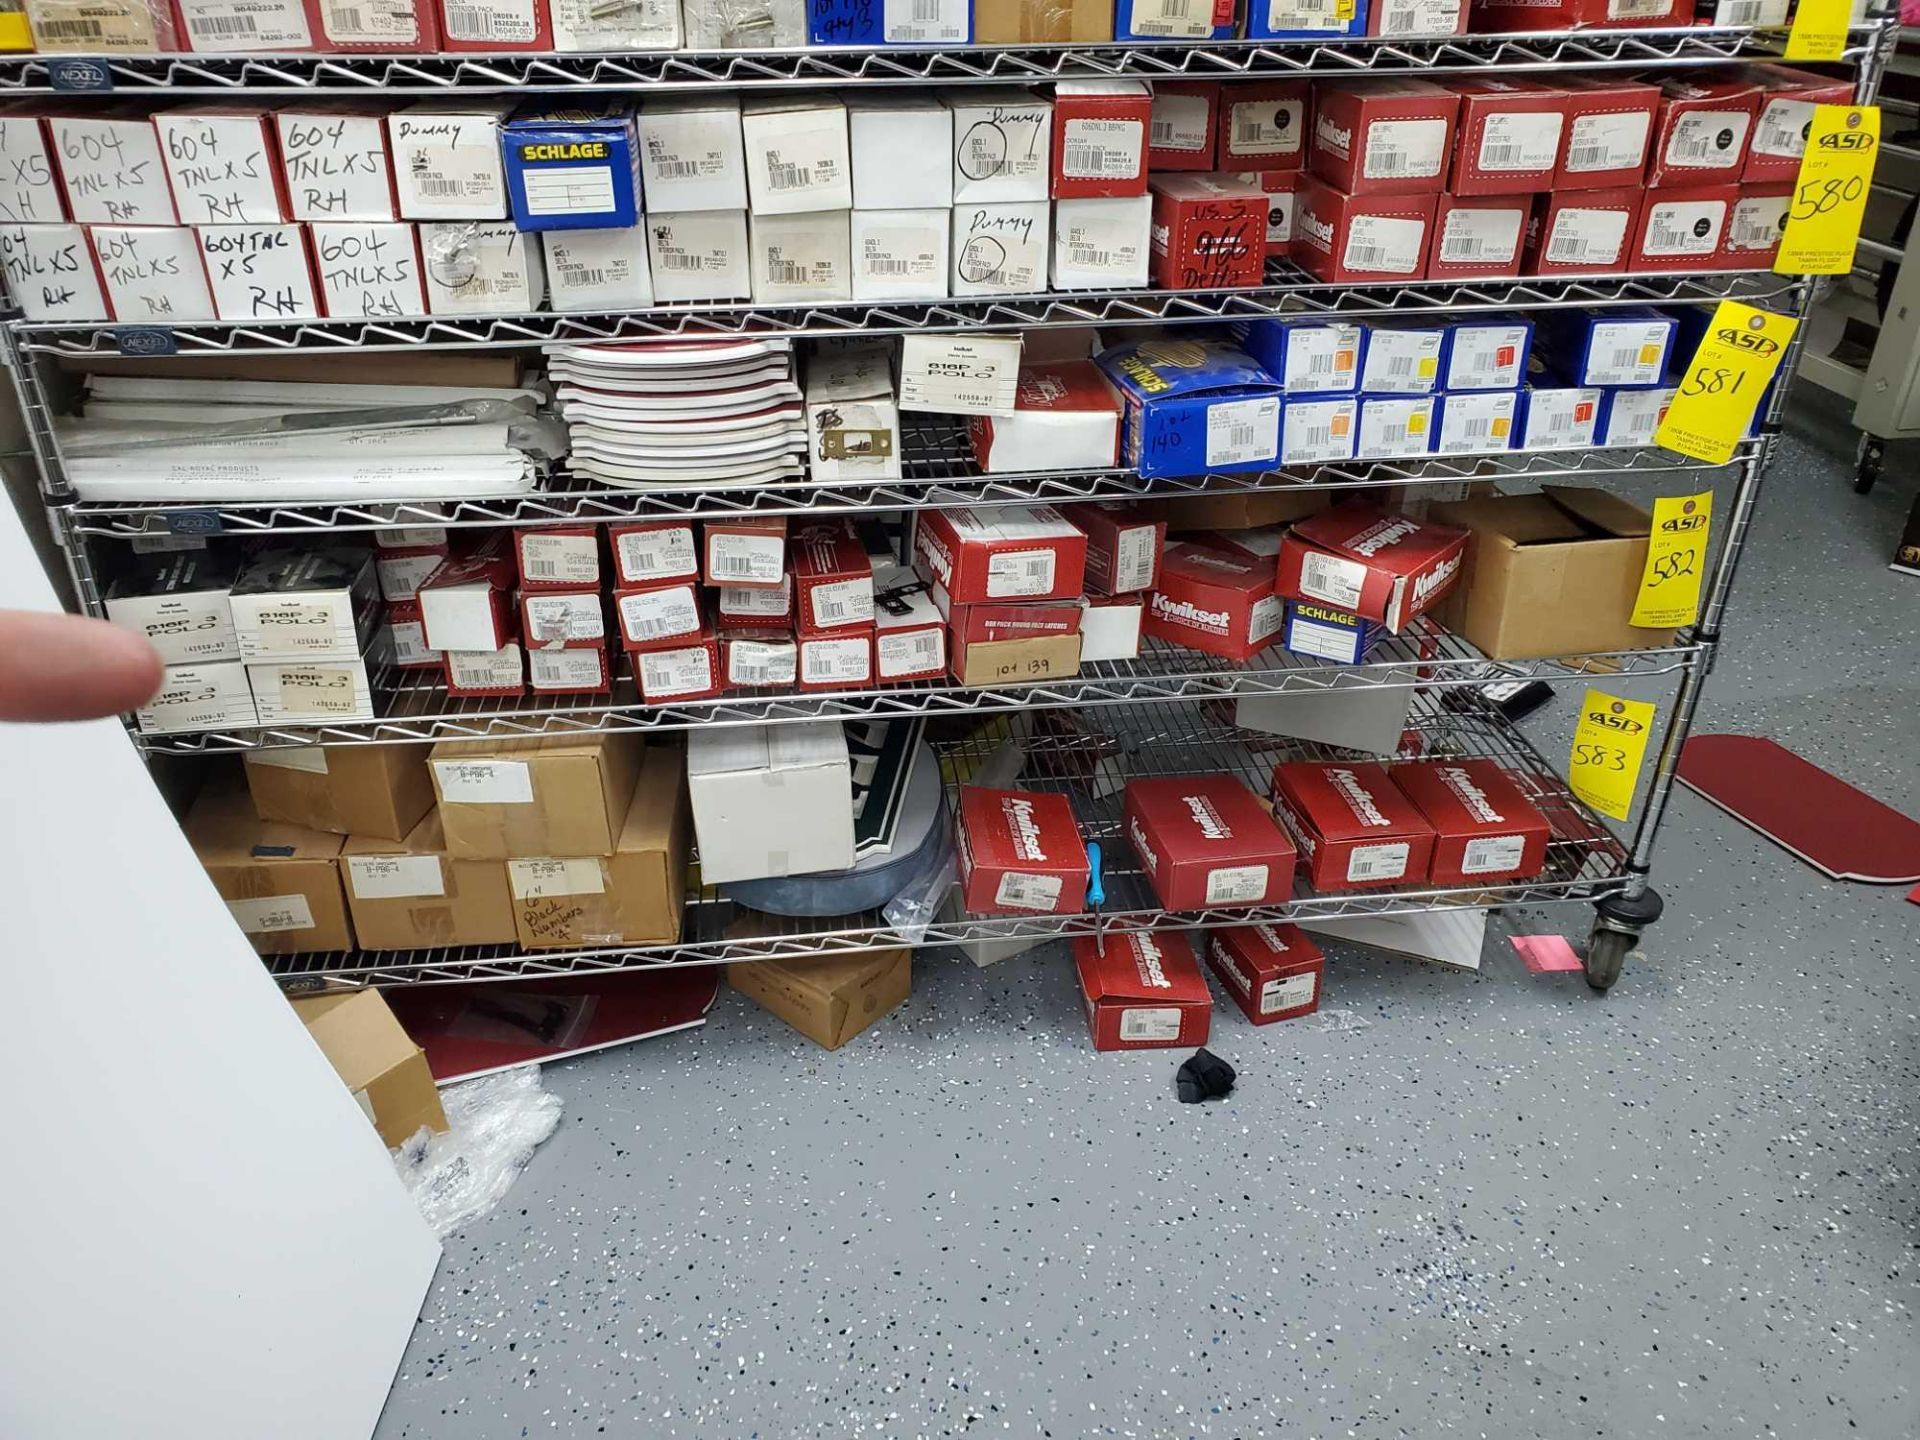 SHELF LOT OF KWIKSET SCHLAGE ETC APPROX 120 BOXES